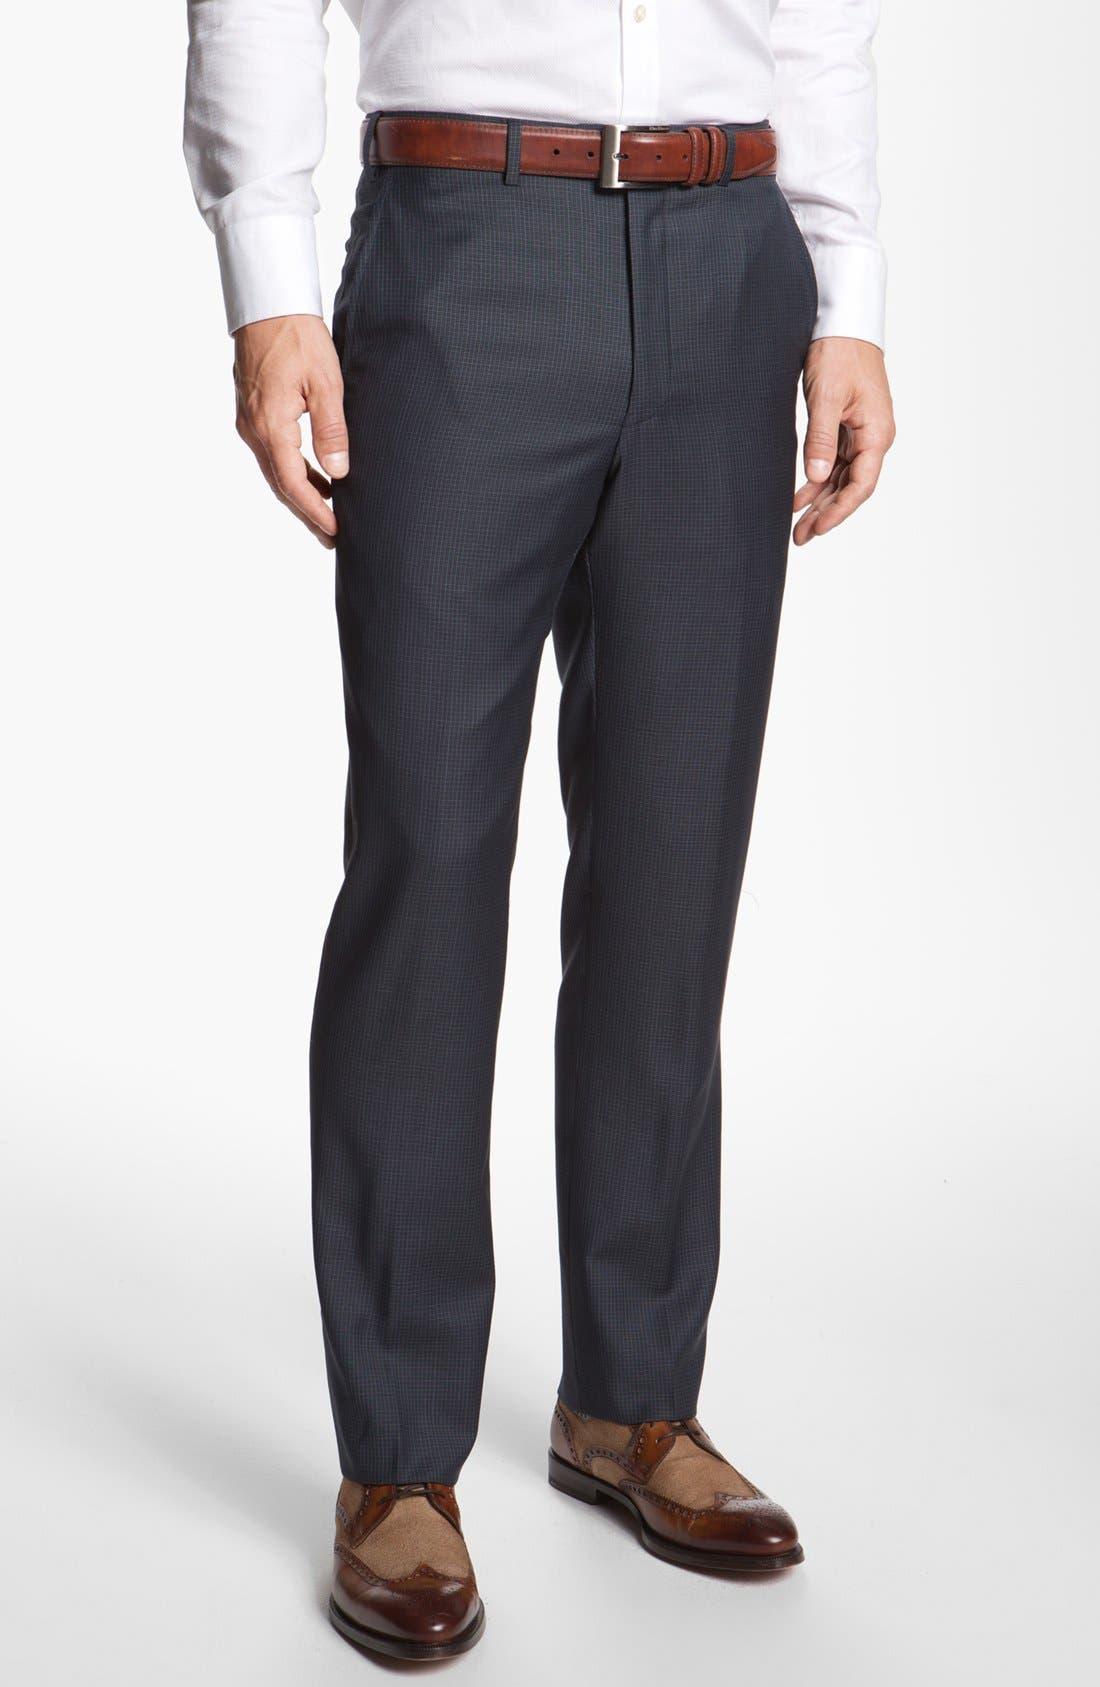 Main Image - Santorelli Flat Front Trousers